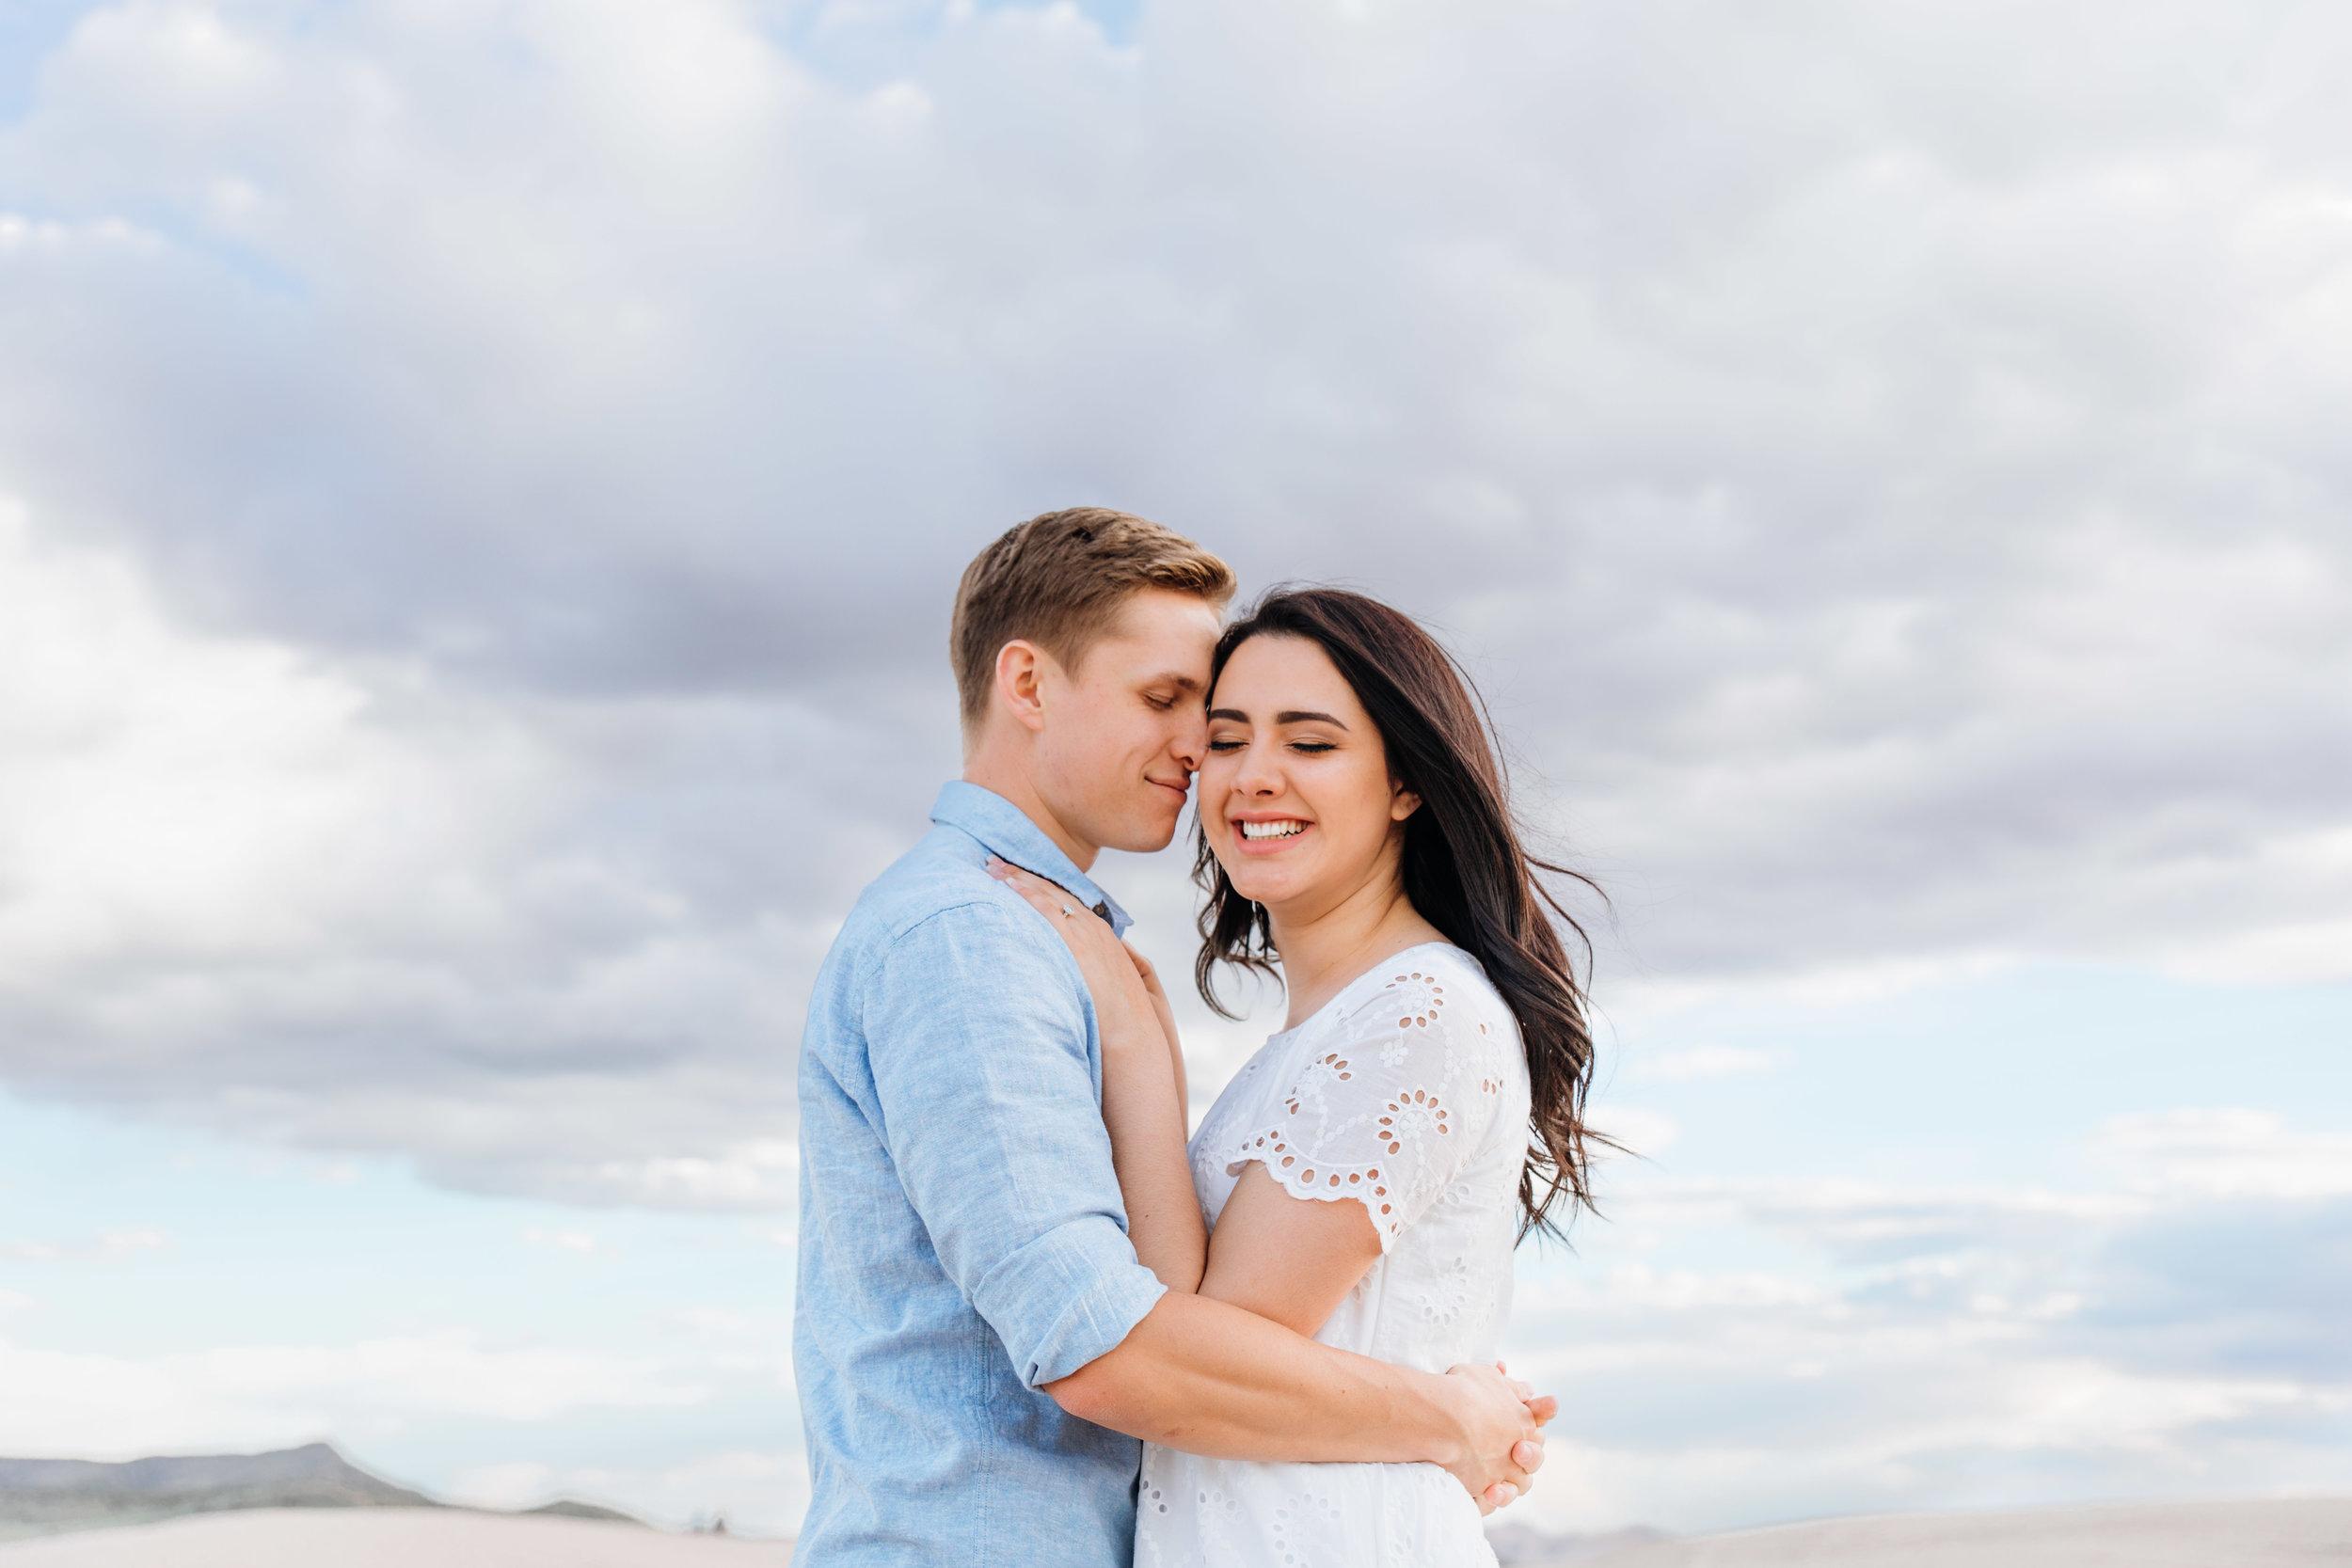 little-sahara-recreation-area-elopement-engagement-wedding-photography-michael-cozzens-27.jpg